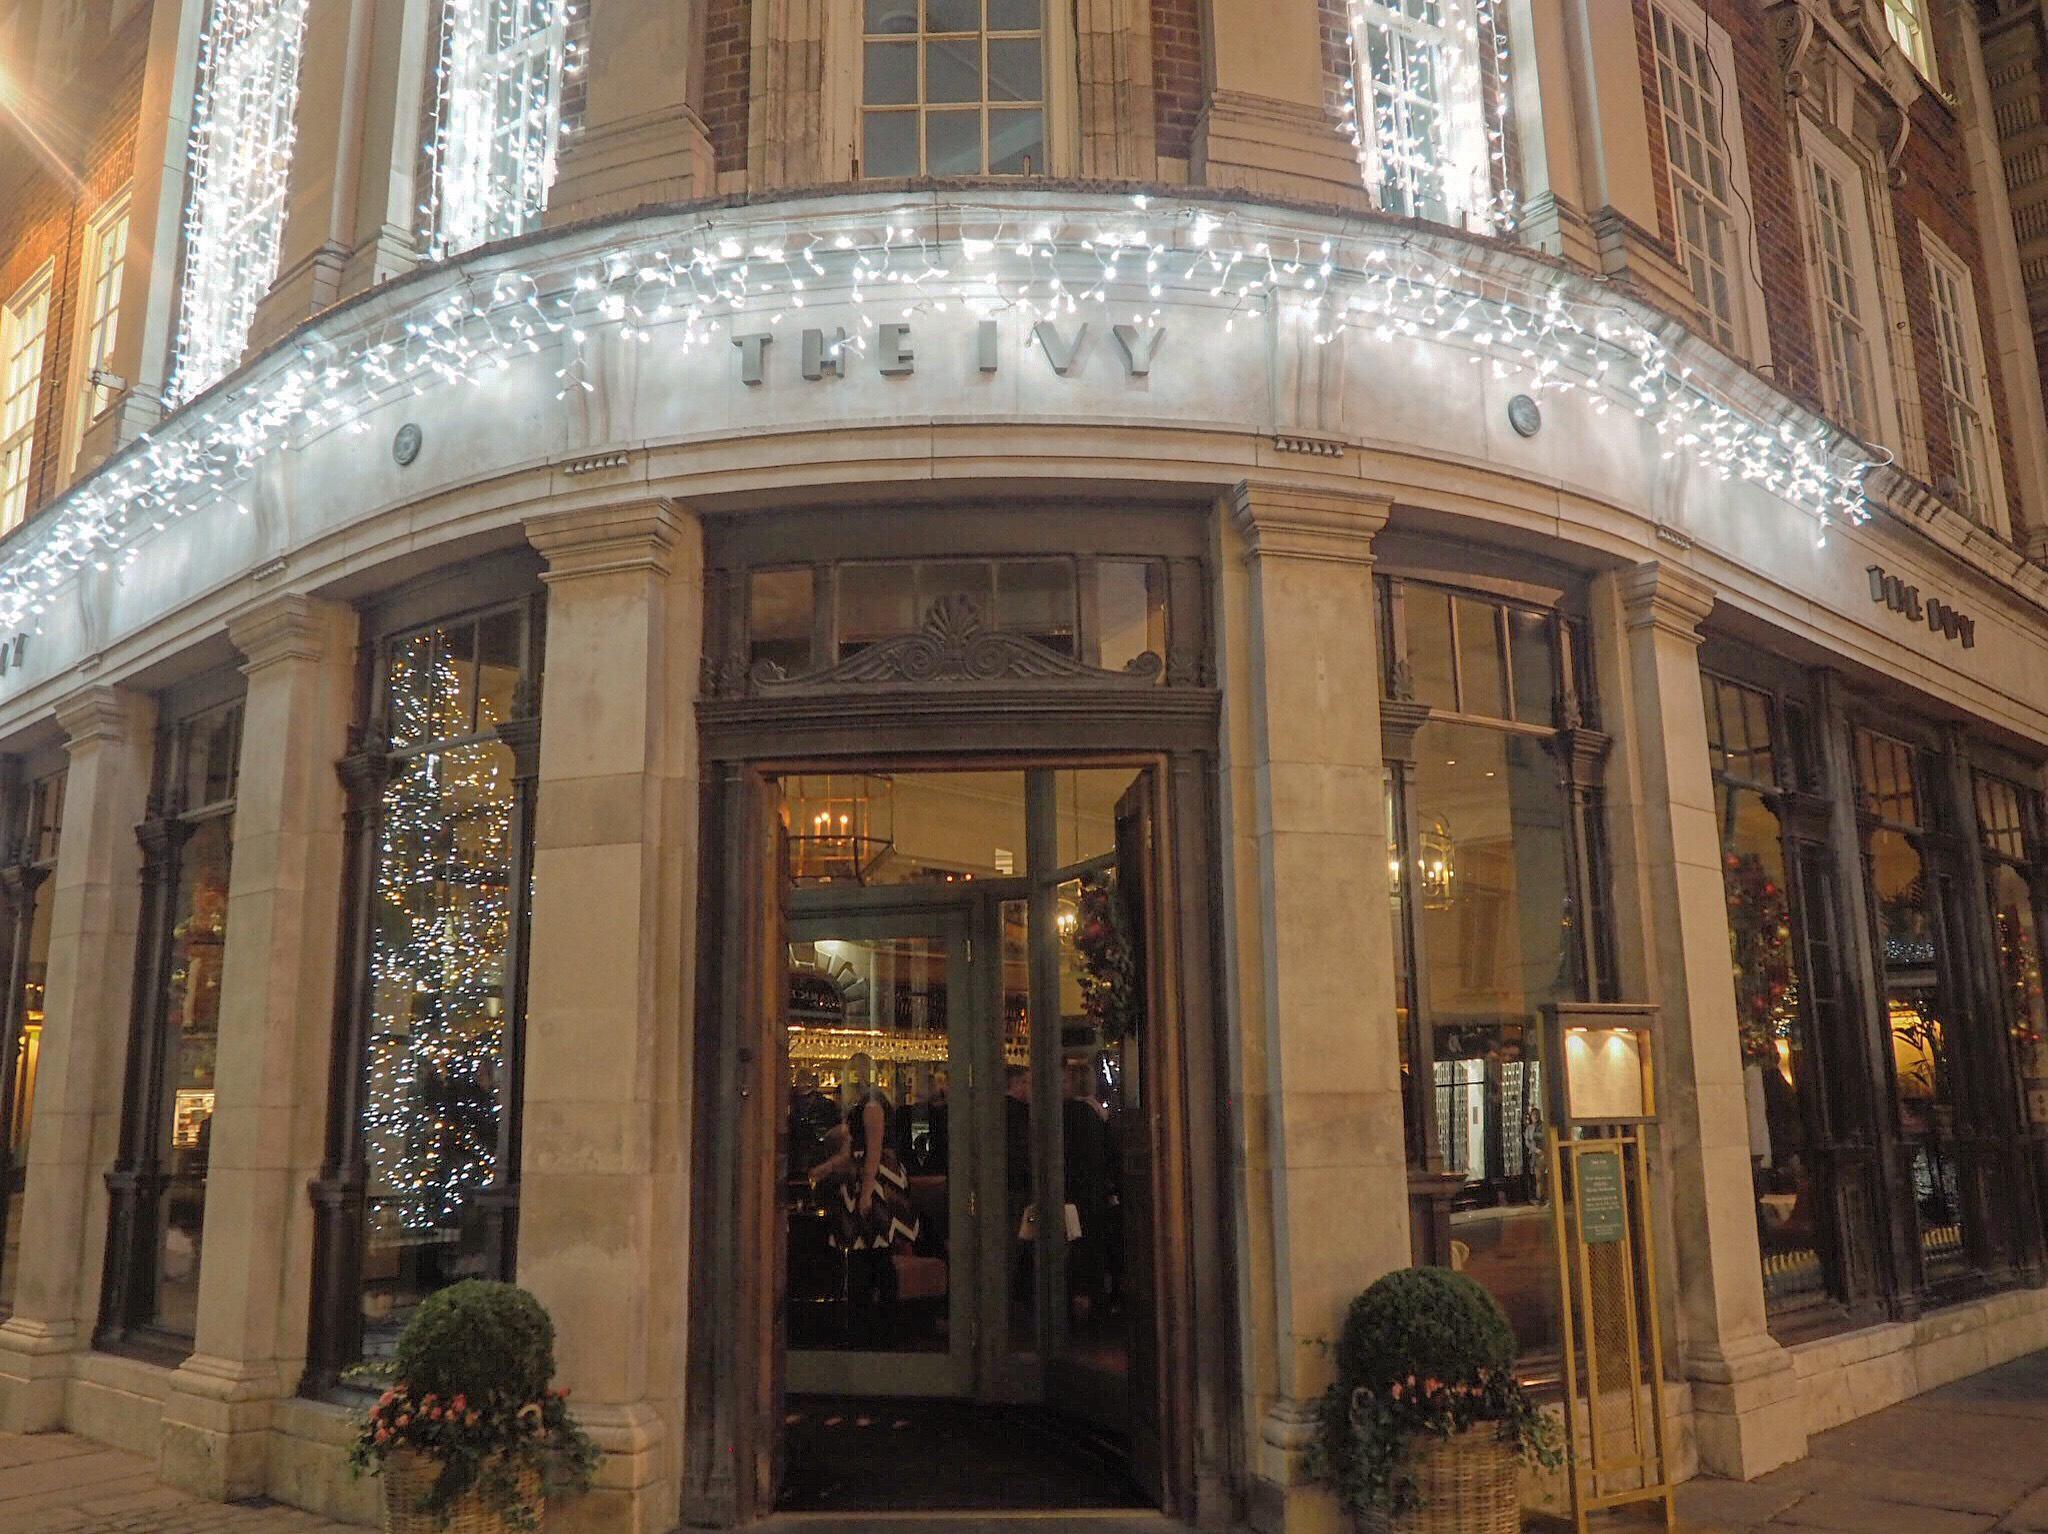 The-Ivy-York-Restaurant